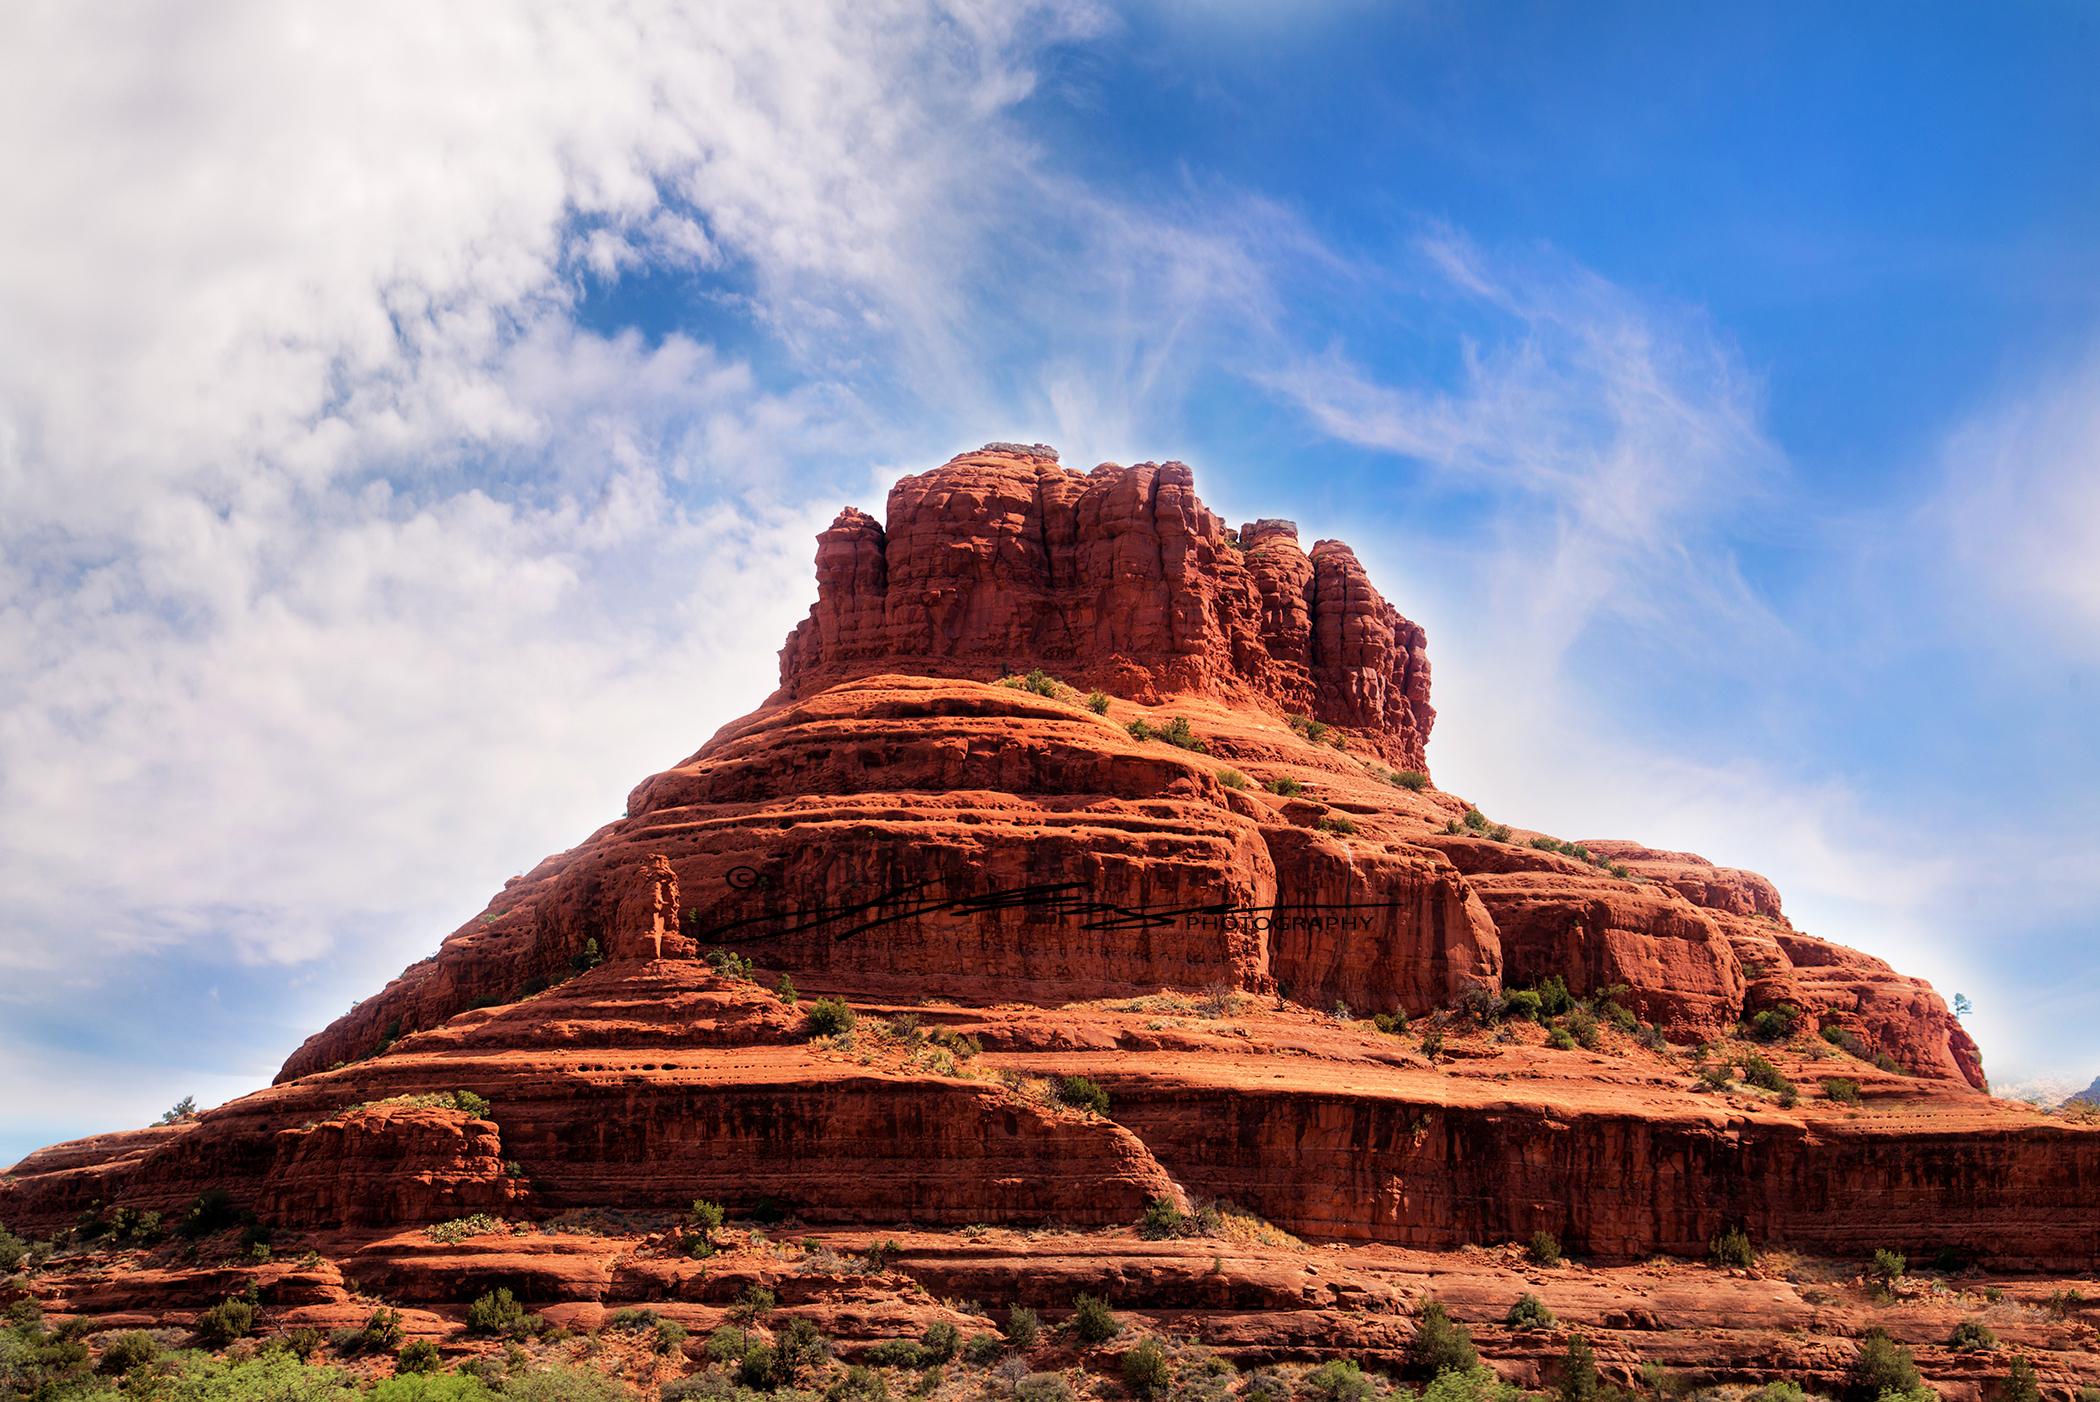 Sedona_Scenecroute_Arizona_Bellrock_travelphotography_jbogerphotography (2).jpg